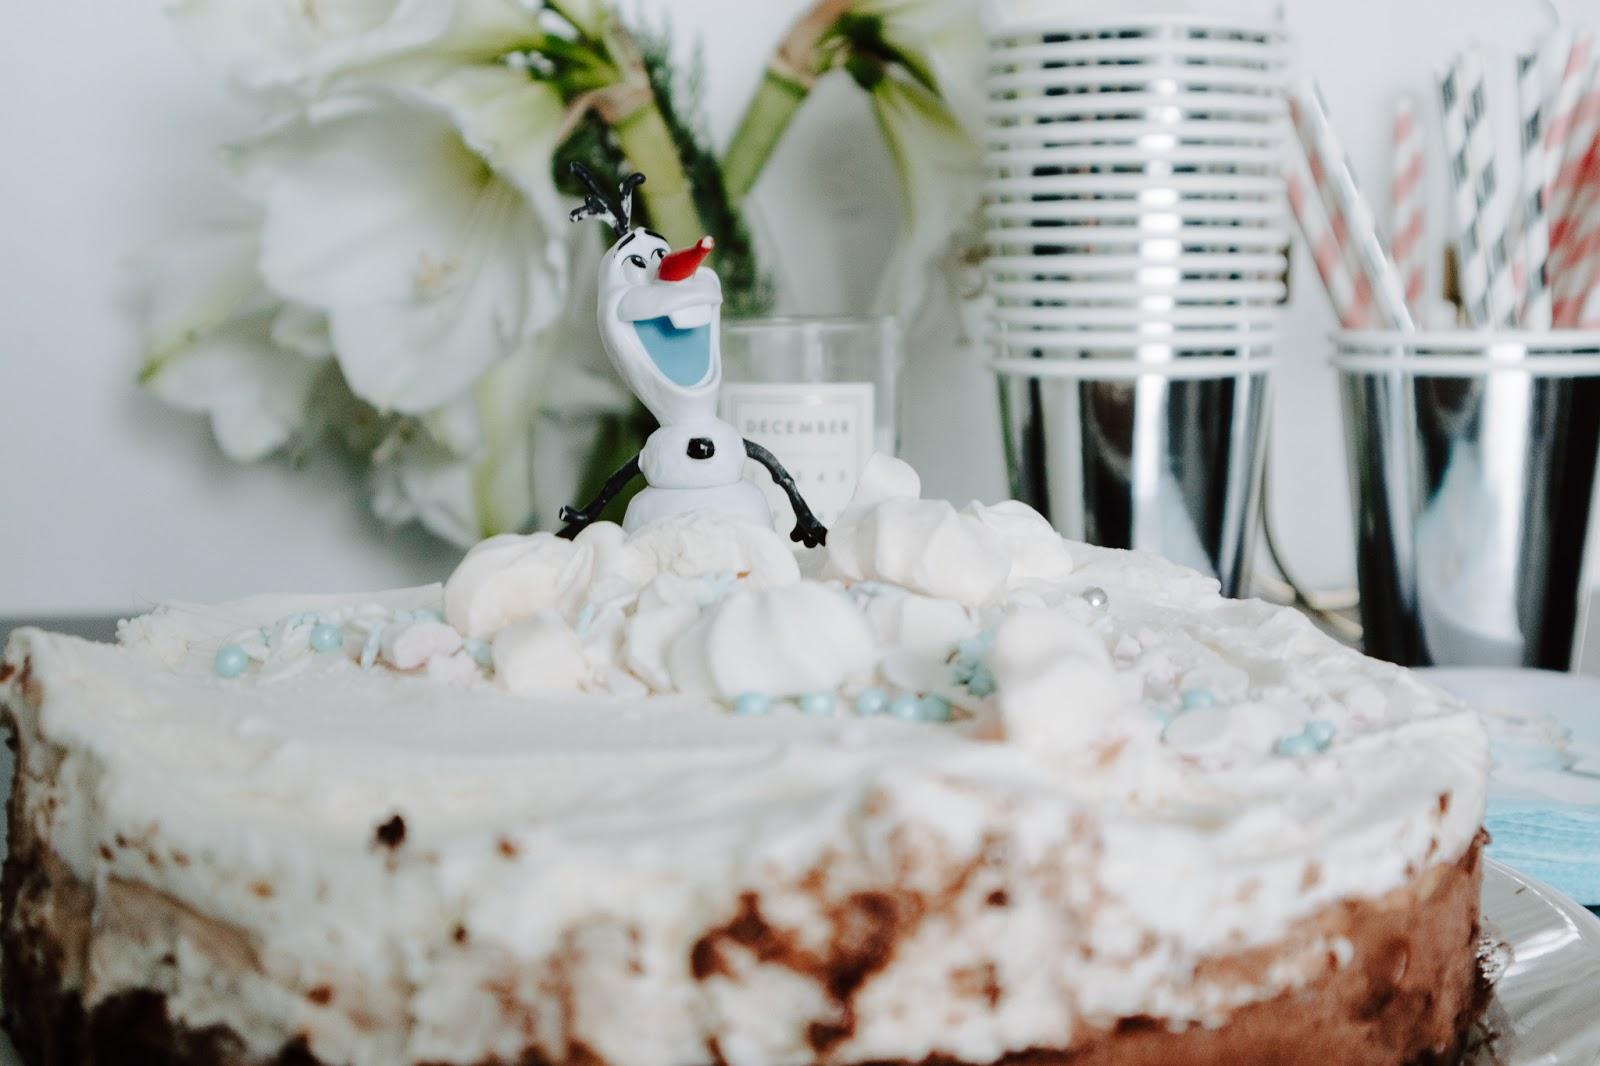 Frozen, teemajuhla, lastenjuhla, lastenkutsu, juhlat